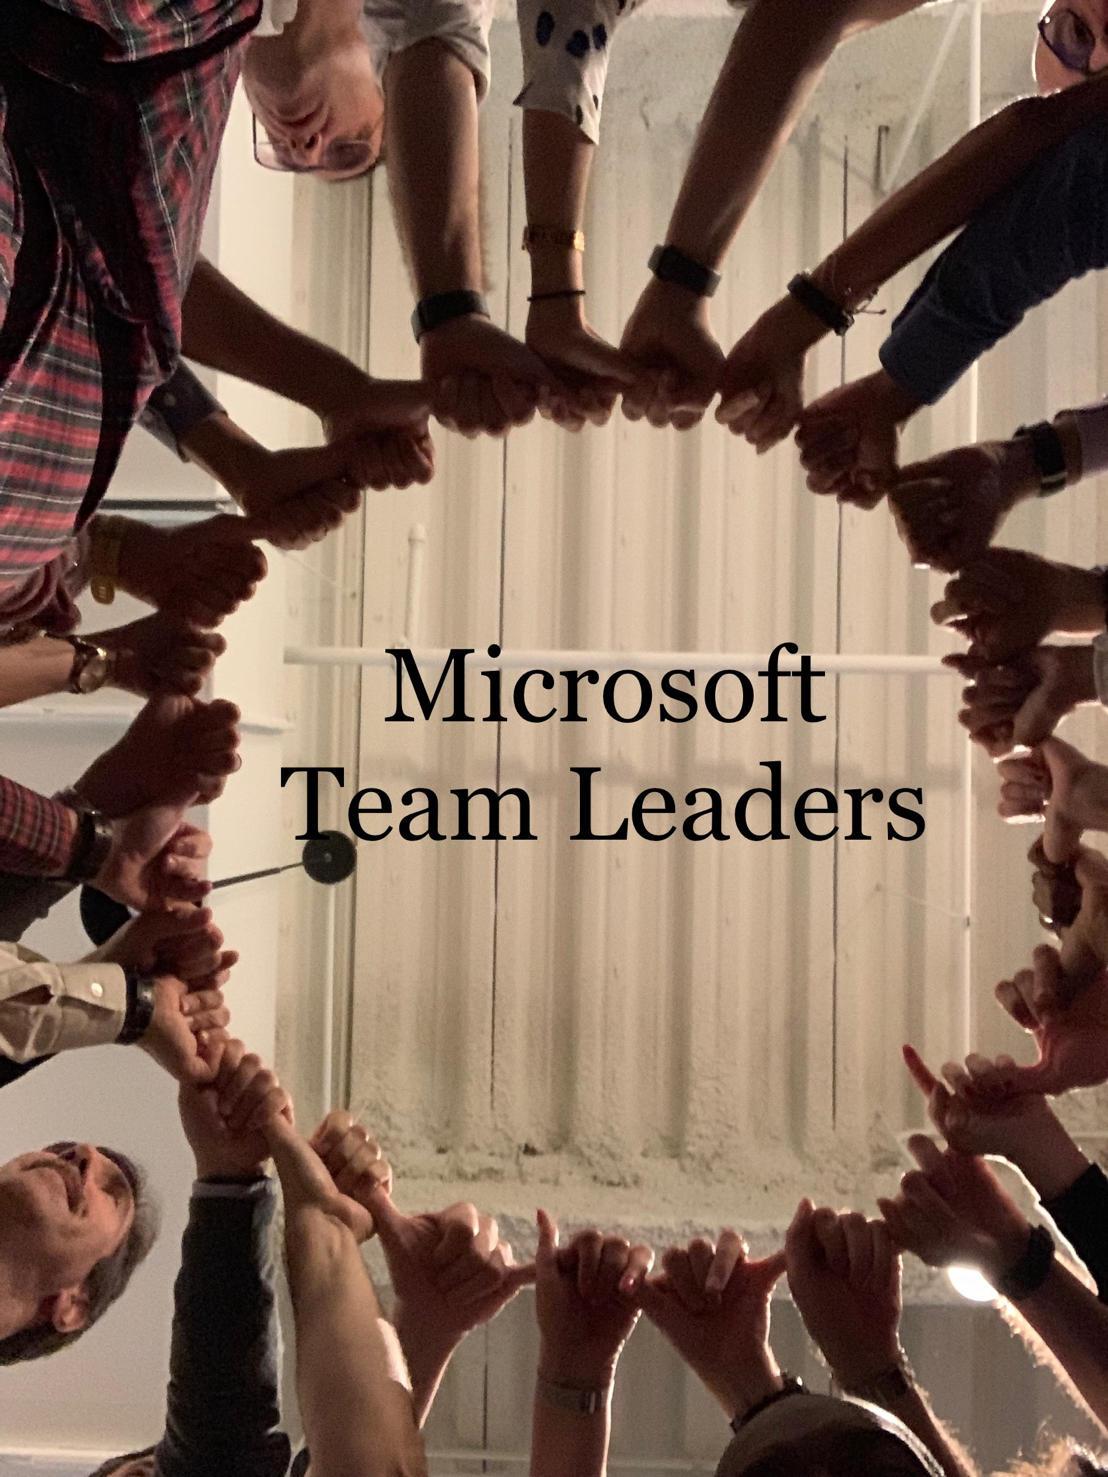 Microsoft Coaching Workshop / Taller de Coaching en Microsoft - Ignacio Isusi